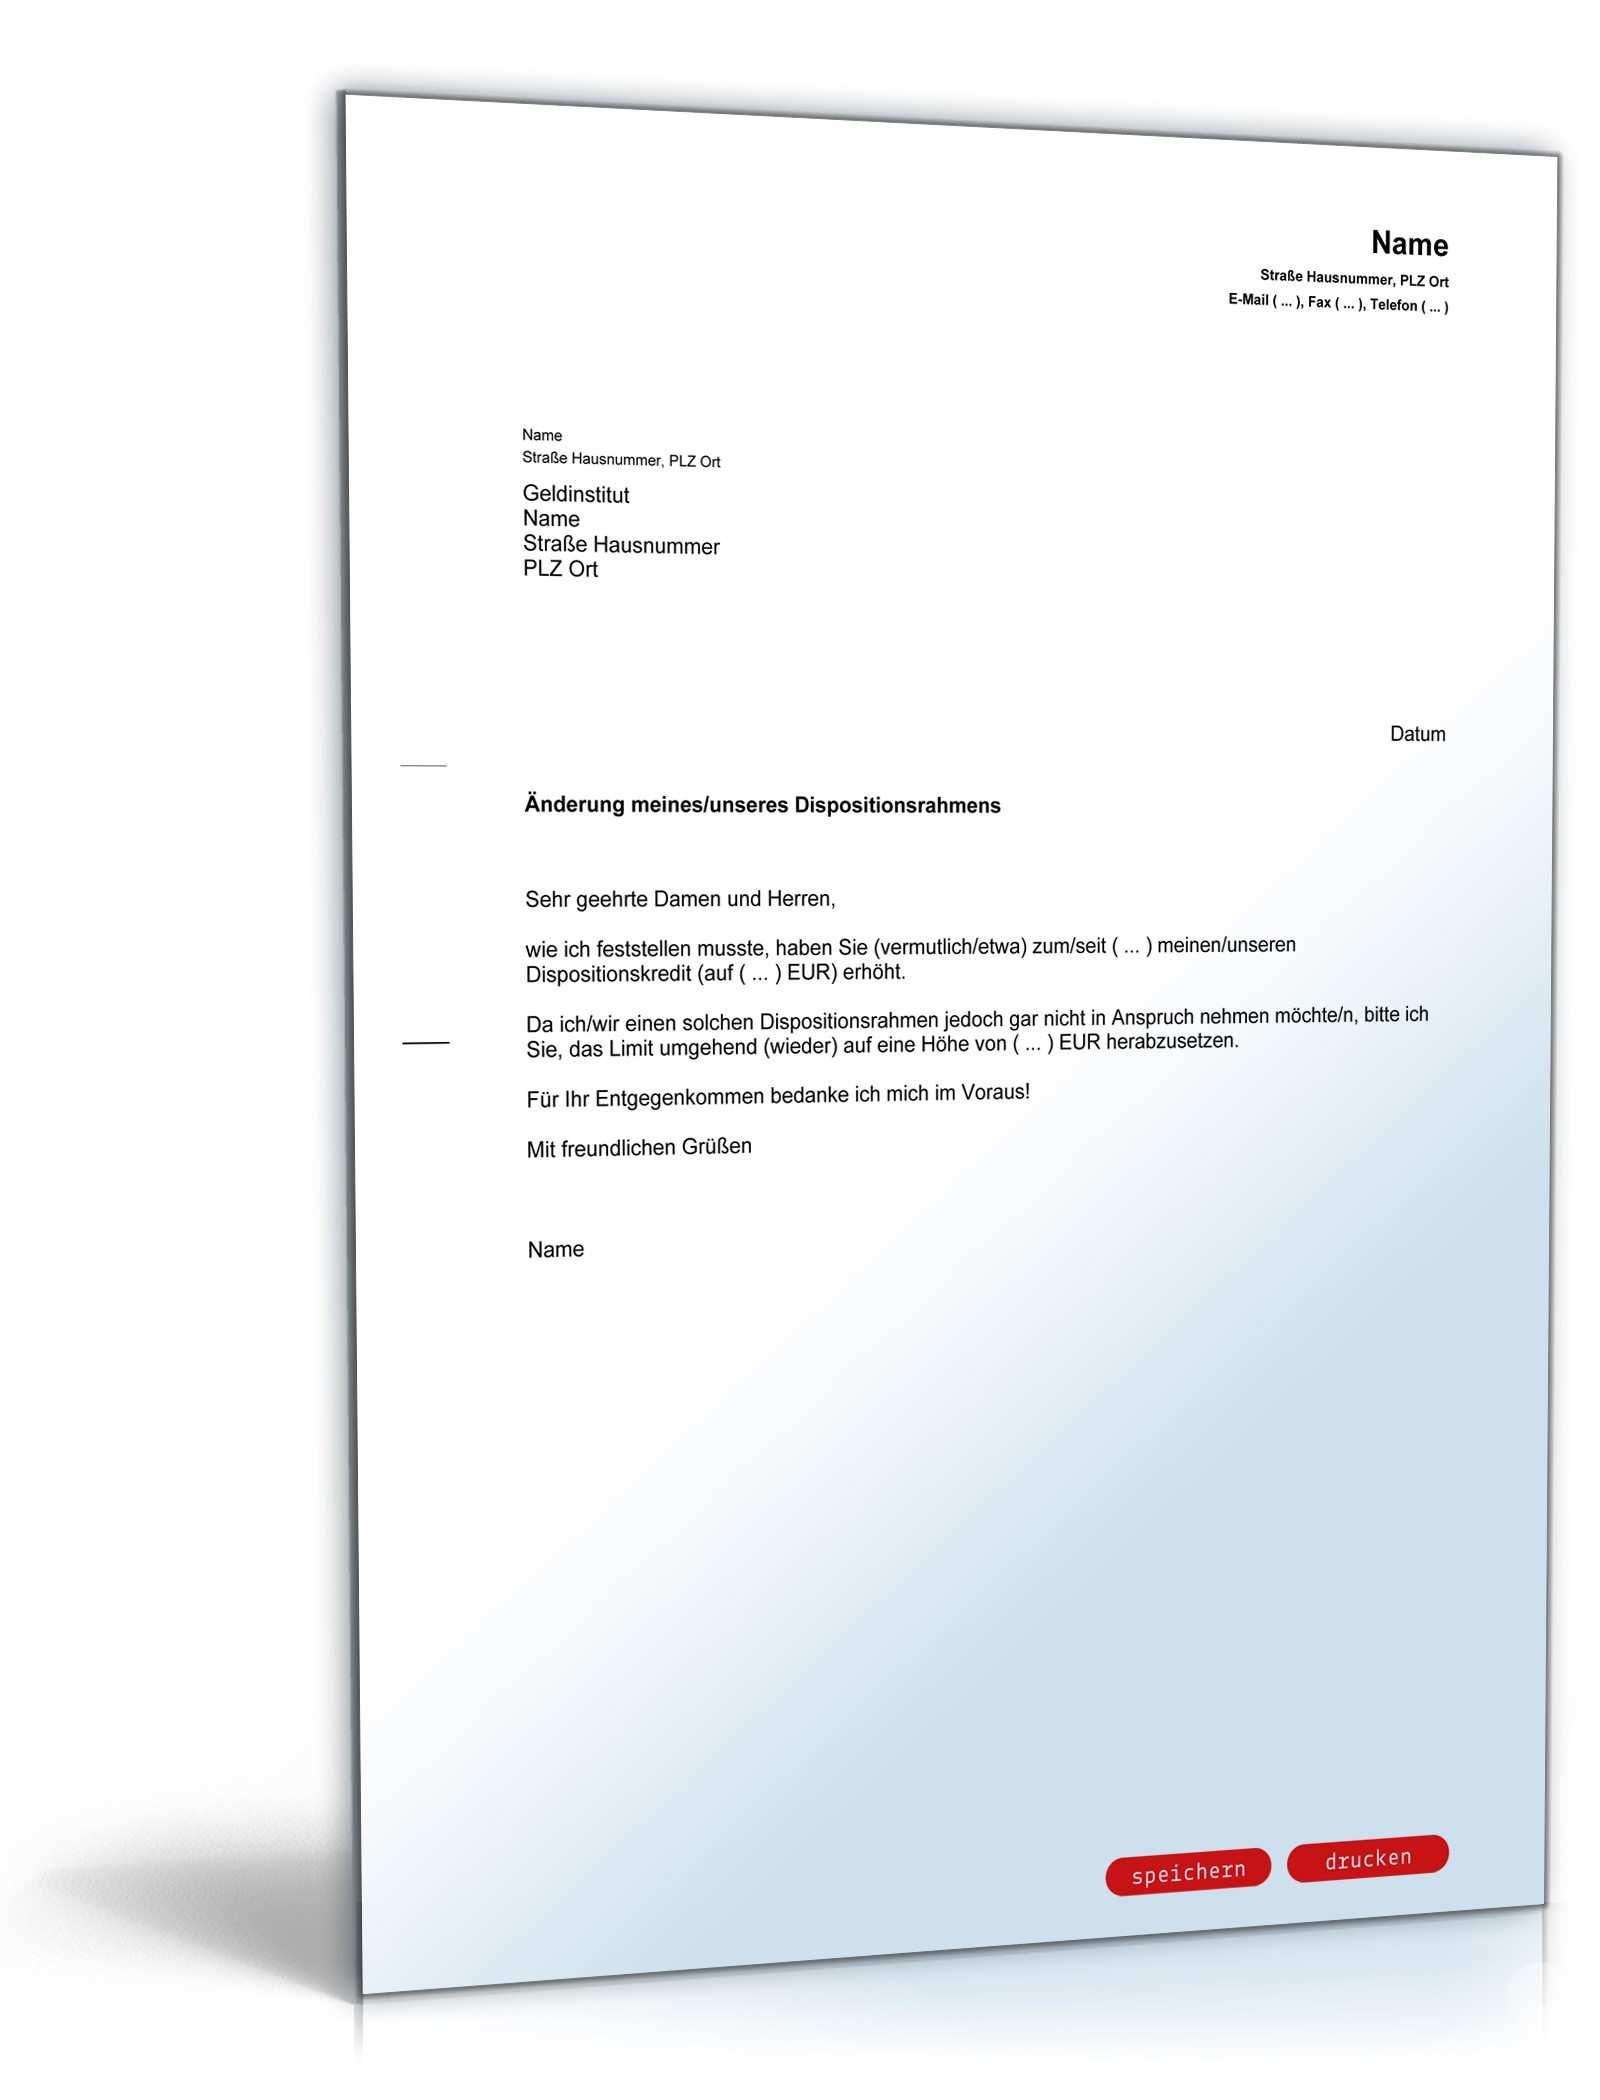 Antrag Senkung Dispositionskredit Vorlage Zum Download